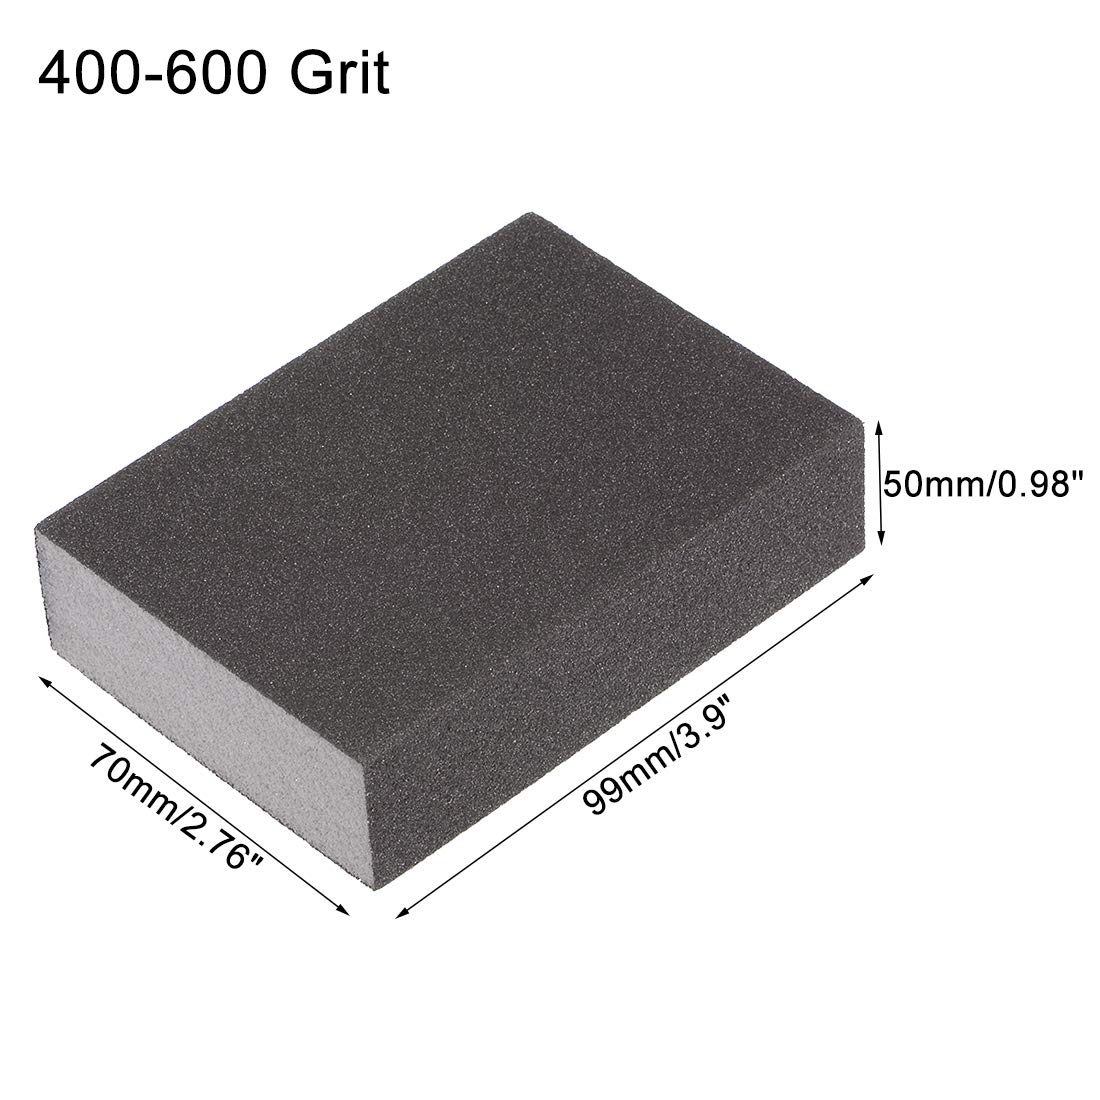 400-600 Grit uxcell Sanding Sponge Block 99mm x 70mm x 25mm a18052400ux0493